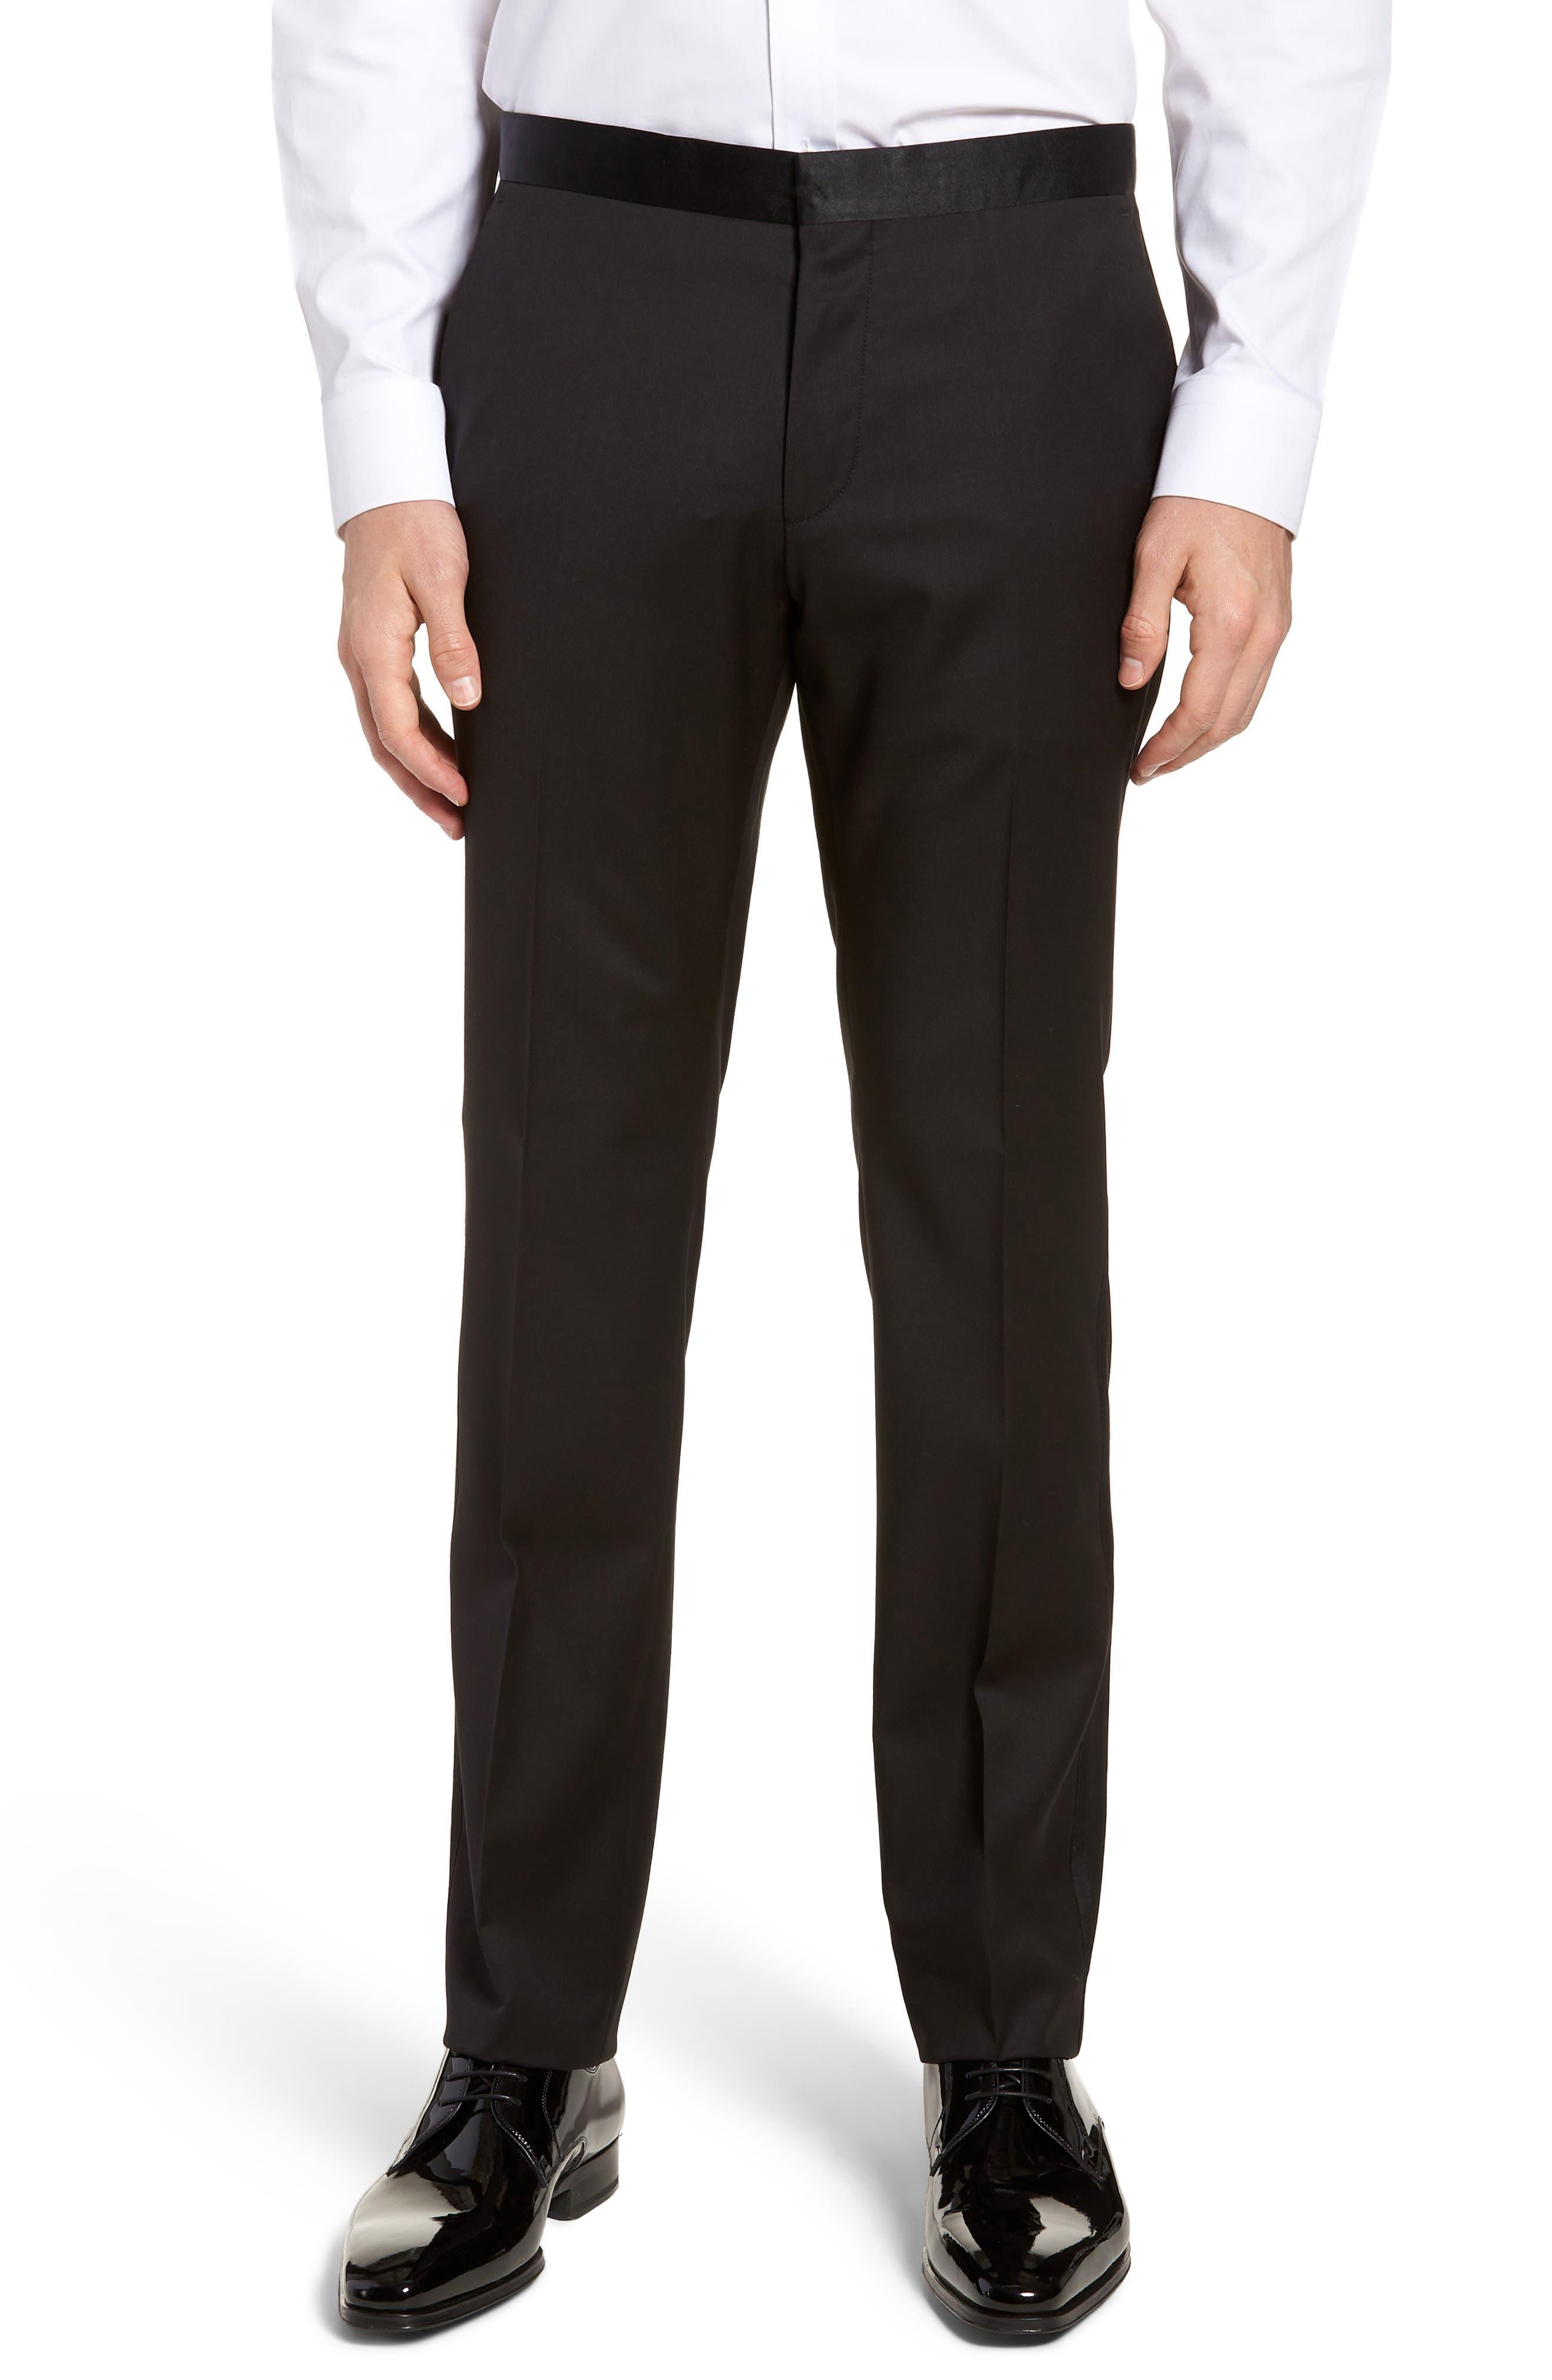 BOSS, Gilan CYL Flat Front Wool Trousers, Main thumbnail 1, color, BLACK